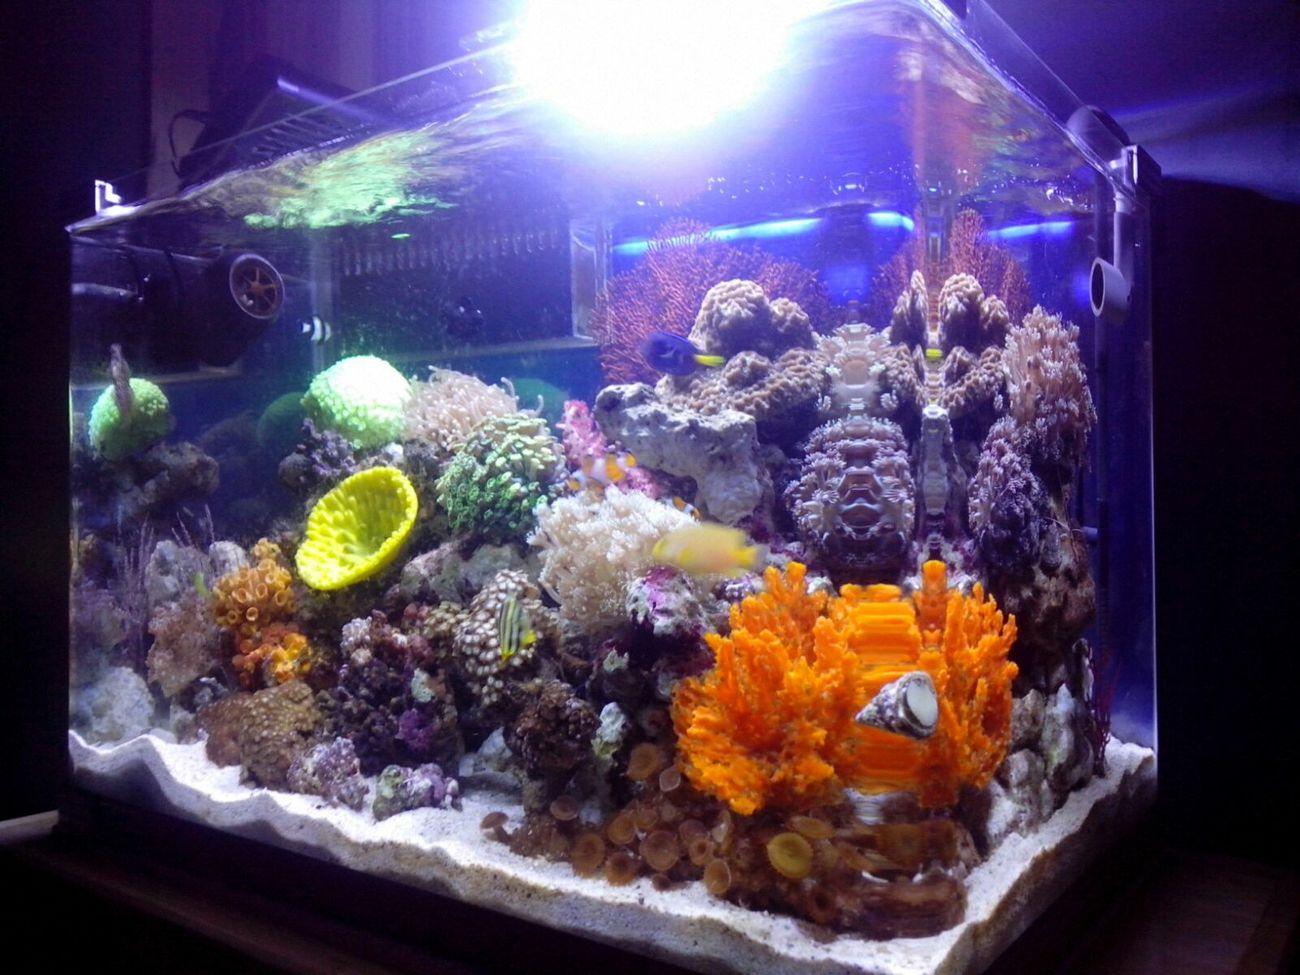 Akuarium Laut Saltwatertank Reeftank Indonesia_allshots Akuarium Aquarium Allshots All_shots Marinelife Saltwaterfish